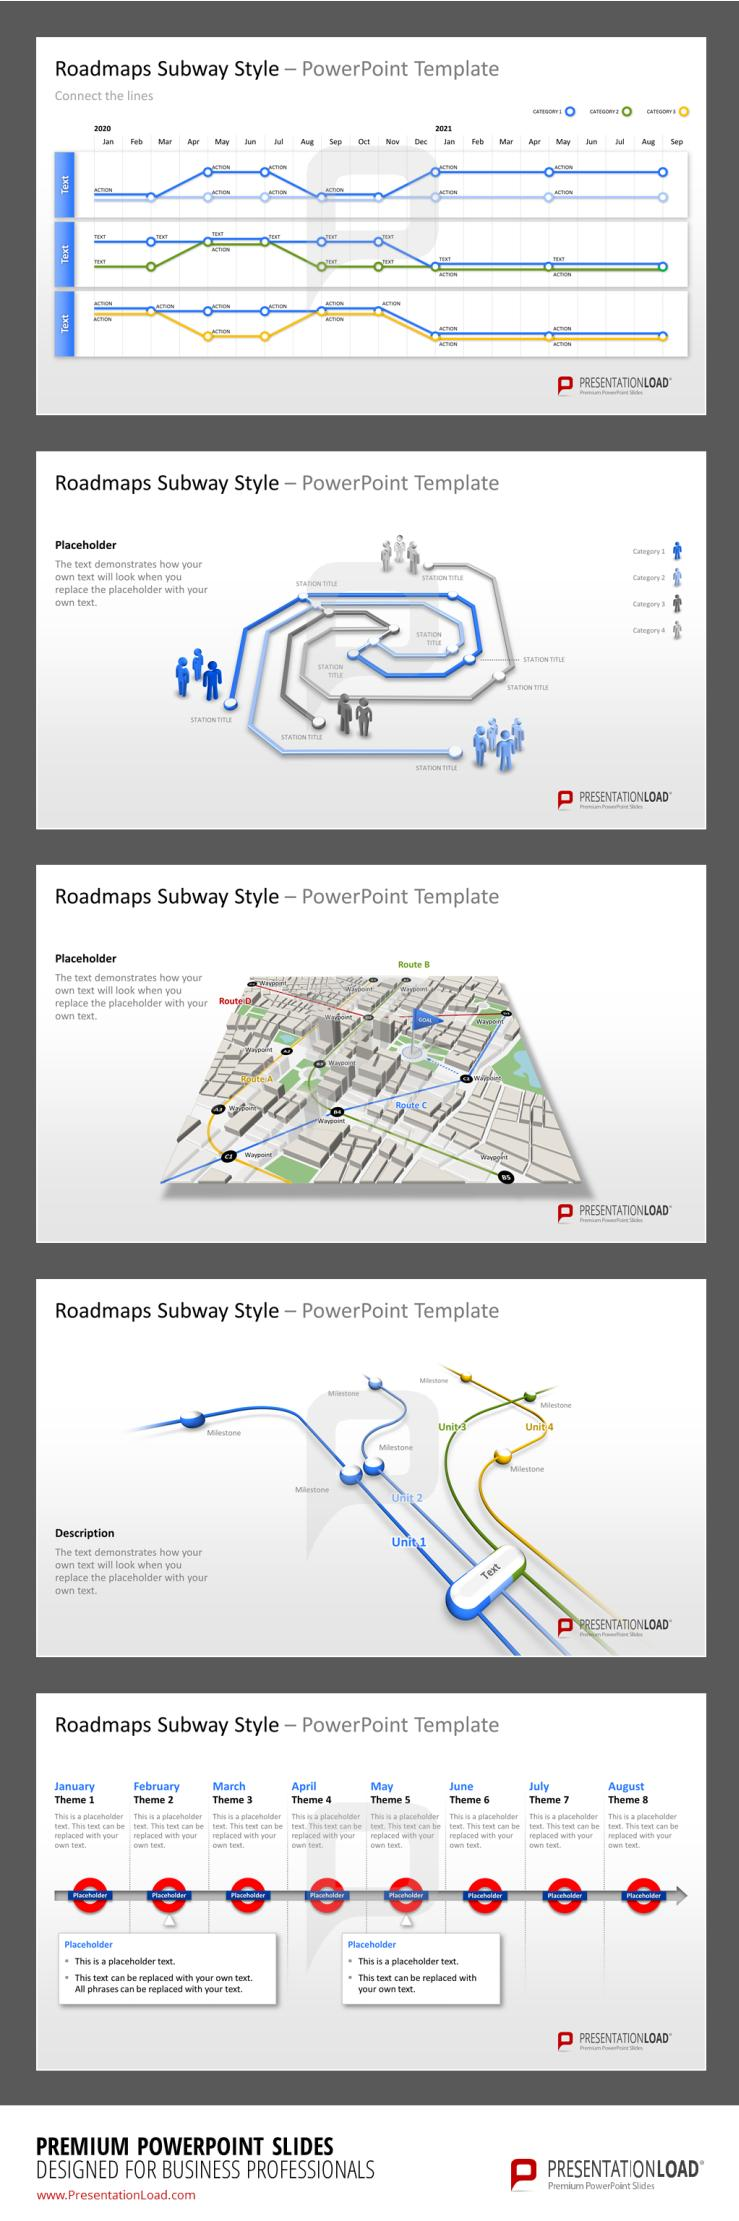 Subway Roadmap PPT Templates #presentationload  Http://www.presentationload.com/roadmaps Subway Style.html